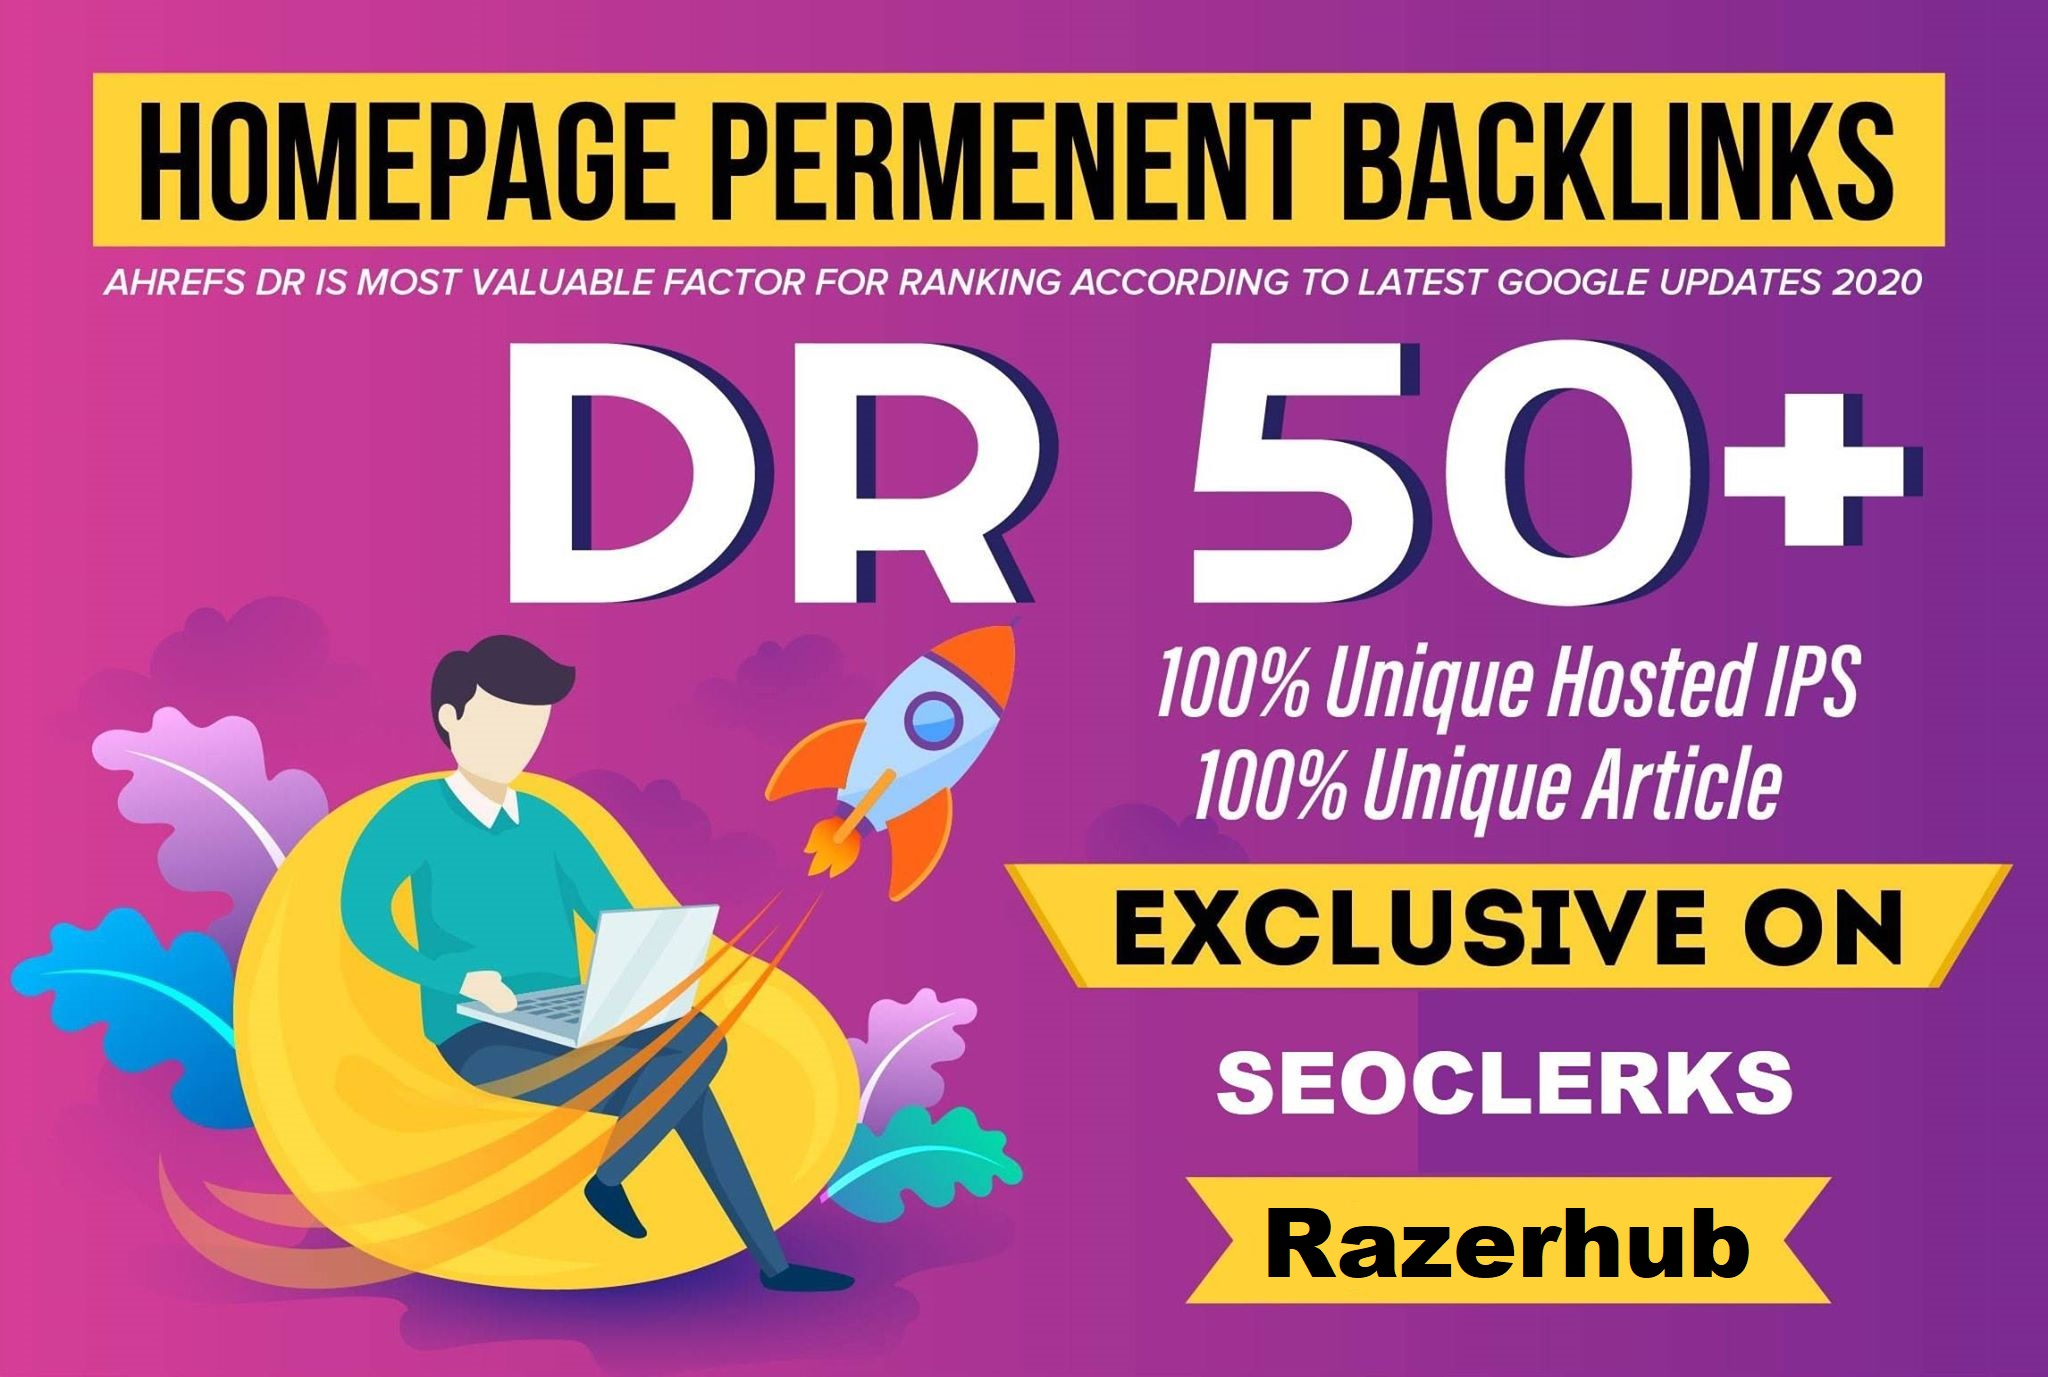 build 10 Manual dr50 plus homepage pbn dofollow Unique backlinks